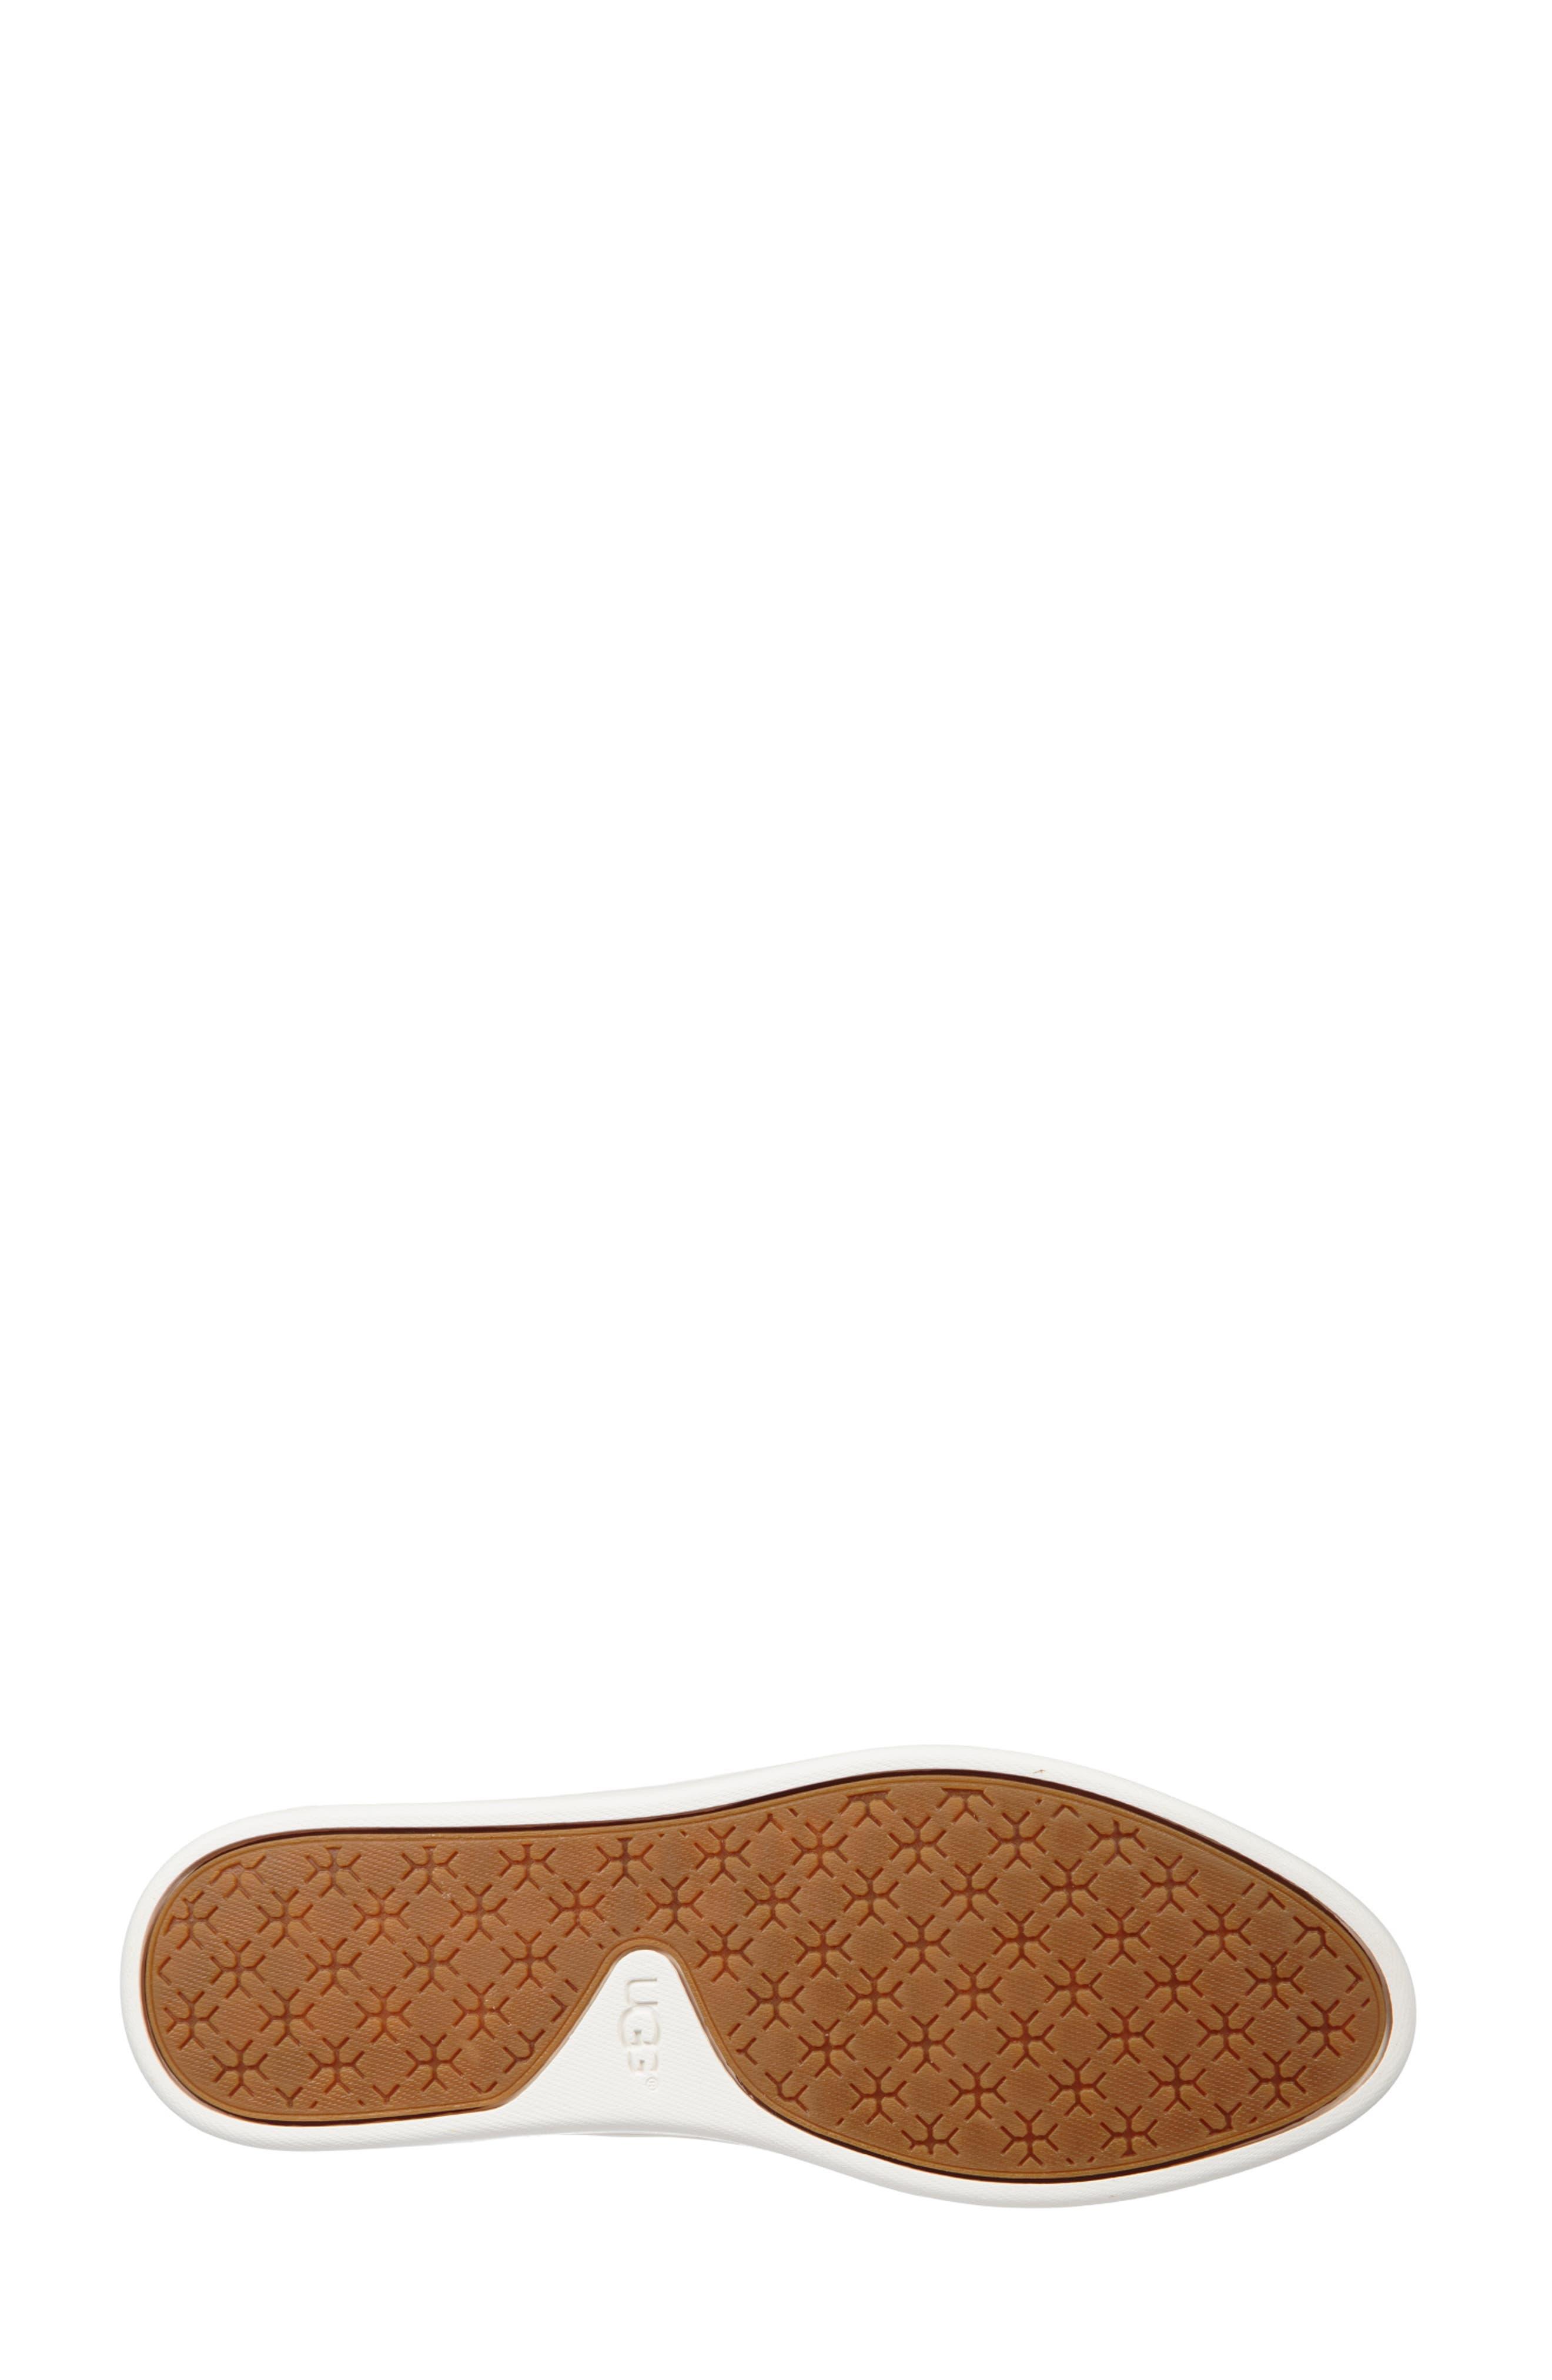 Soleda Slip-On Sneaker,                             Alternate thumbnail 5, color,                             CHARCOAL LEATHER